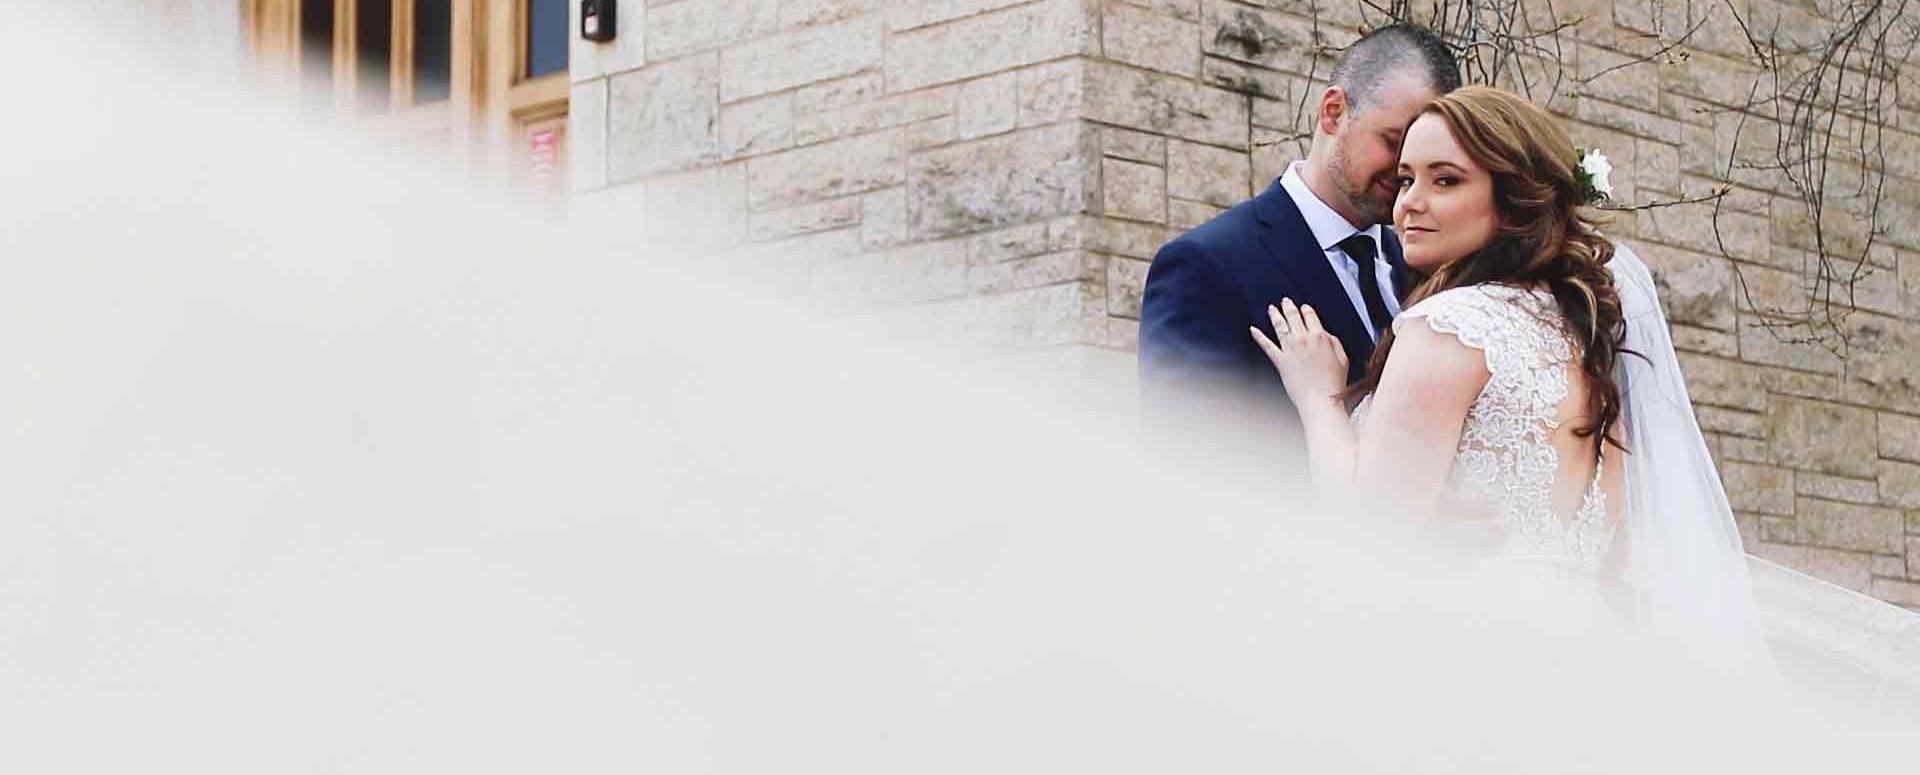 wedding at St. Joseph's Basilica in Edmonton, Alberta